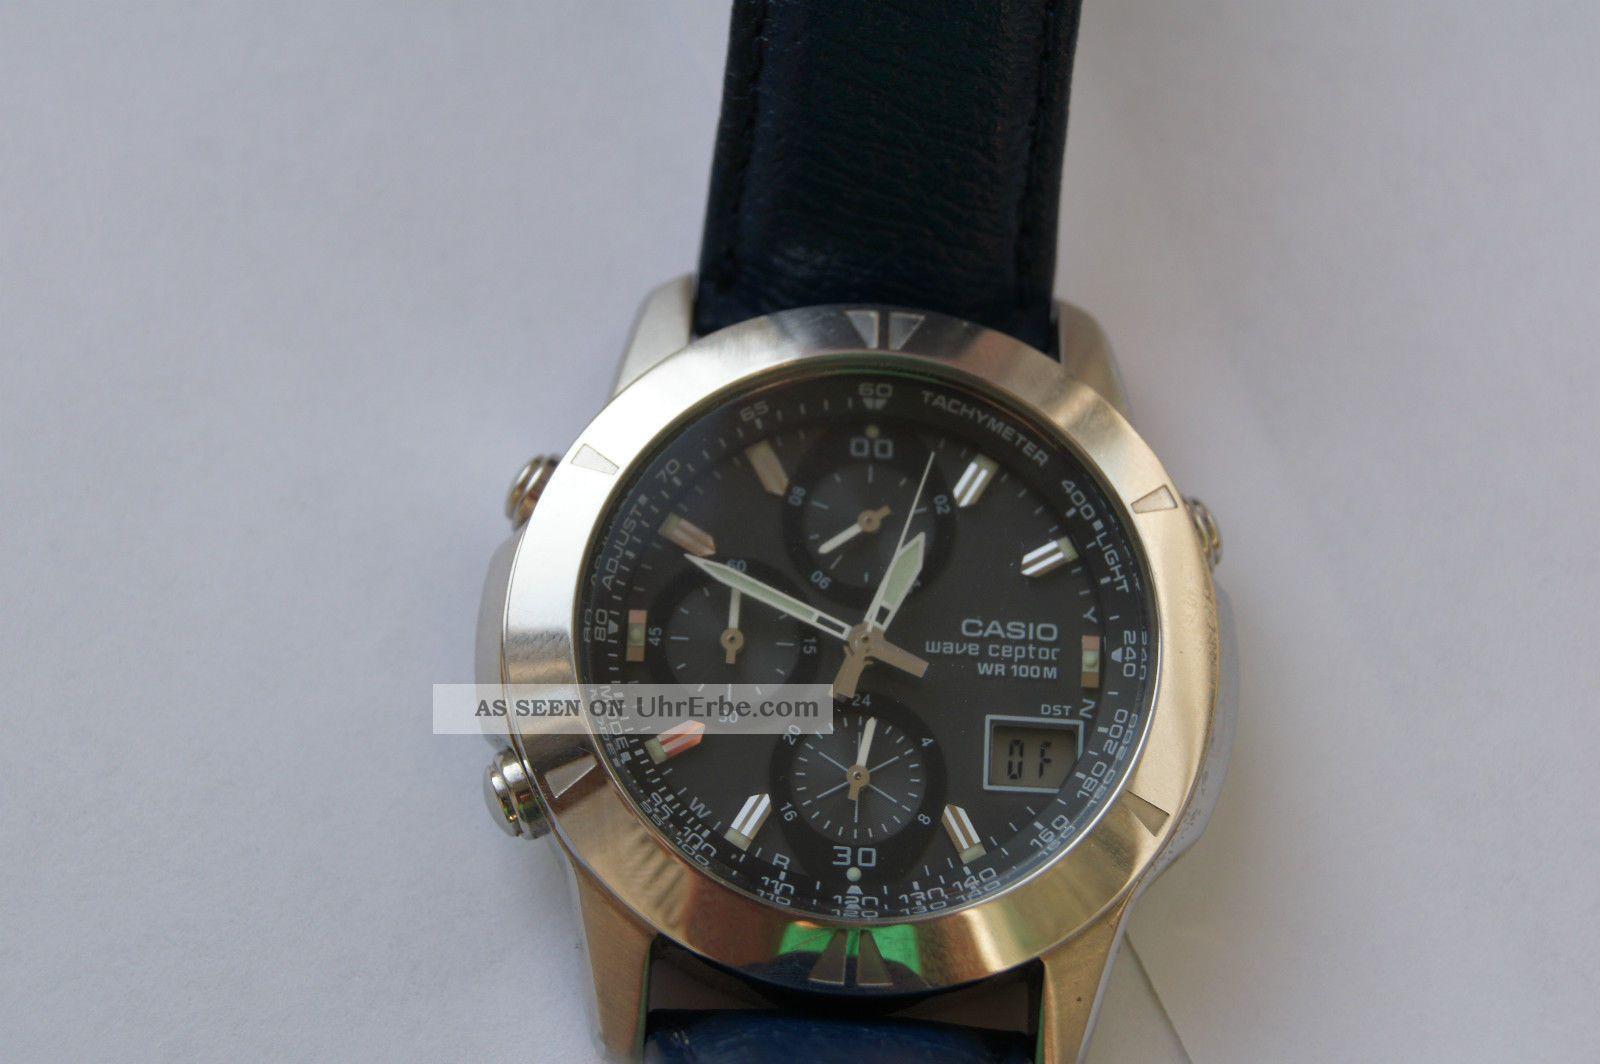 Casio Herrenuhr Funkuhr Wvq560le - 8aver Armbanduhr 10 Bar Lederarmband Armbanduhren Bild